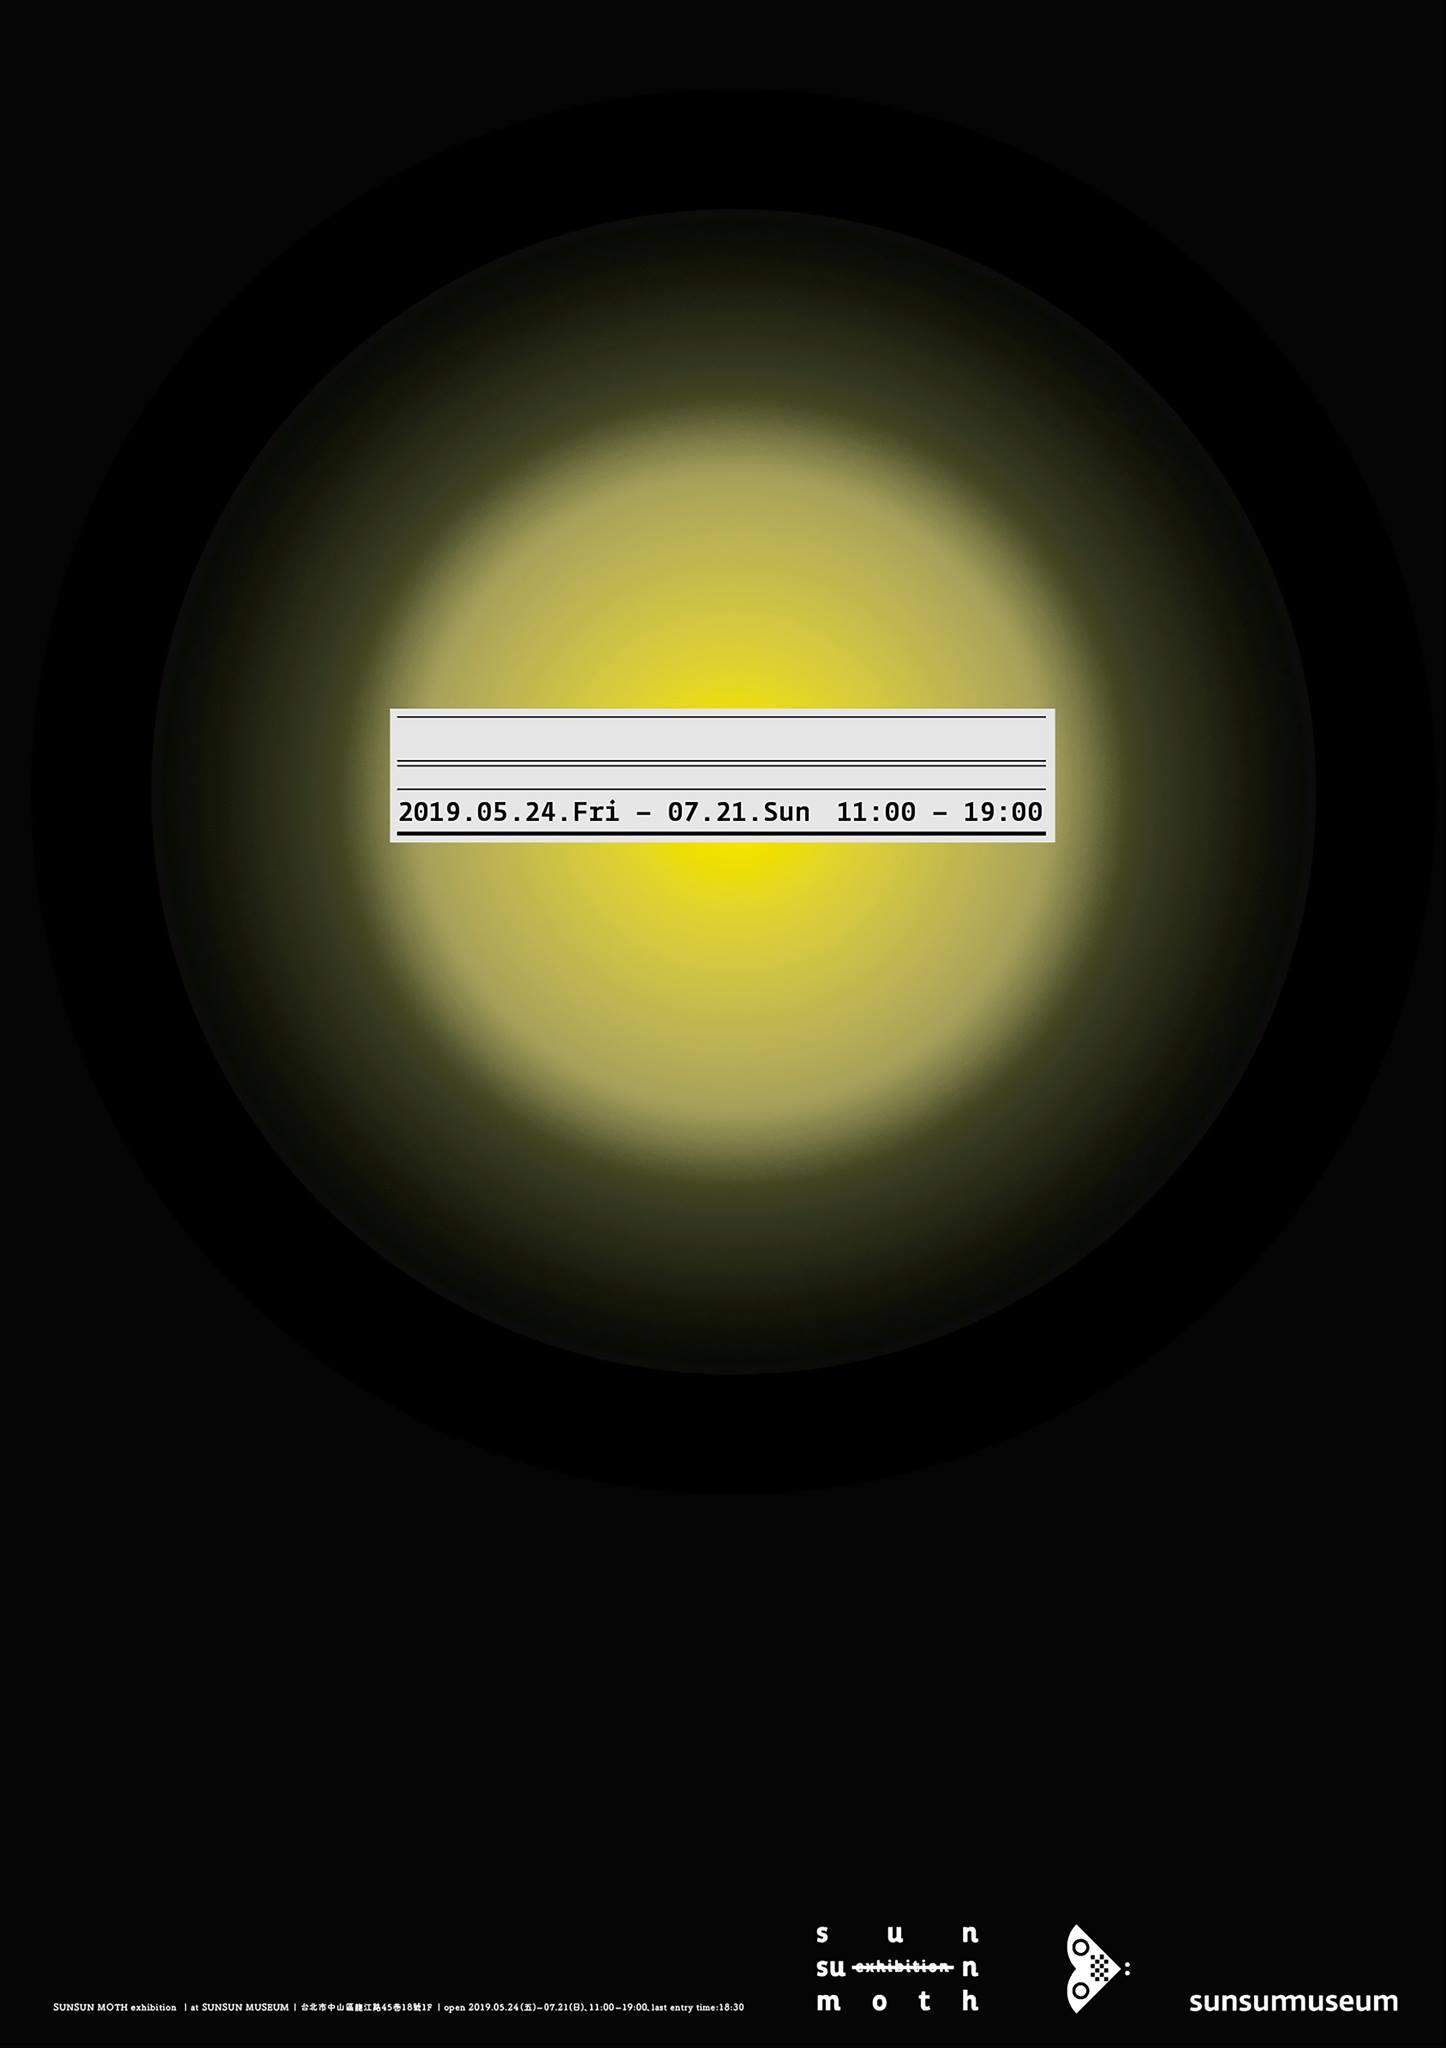 001 光